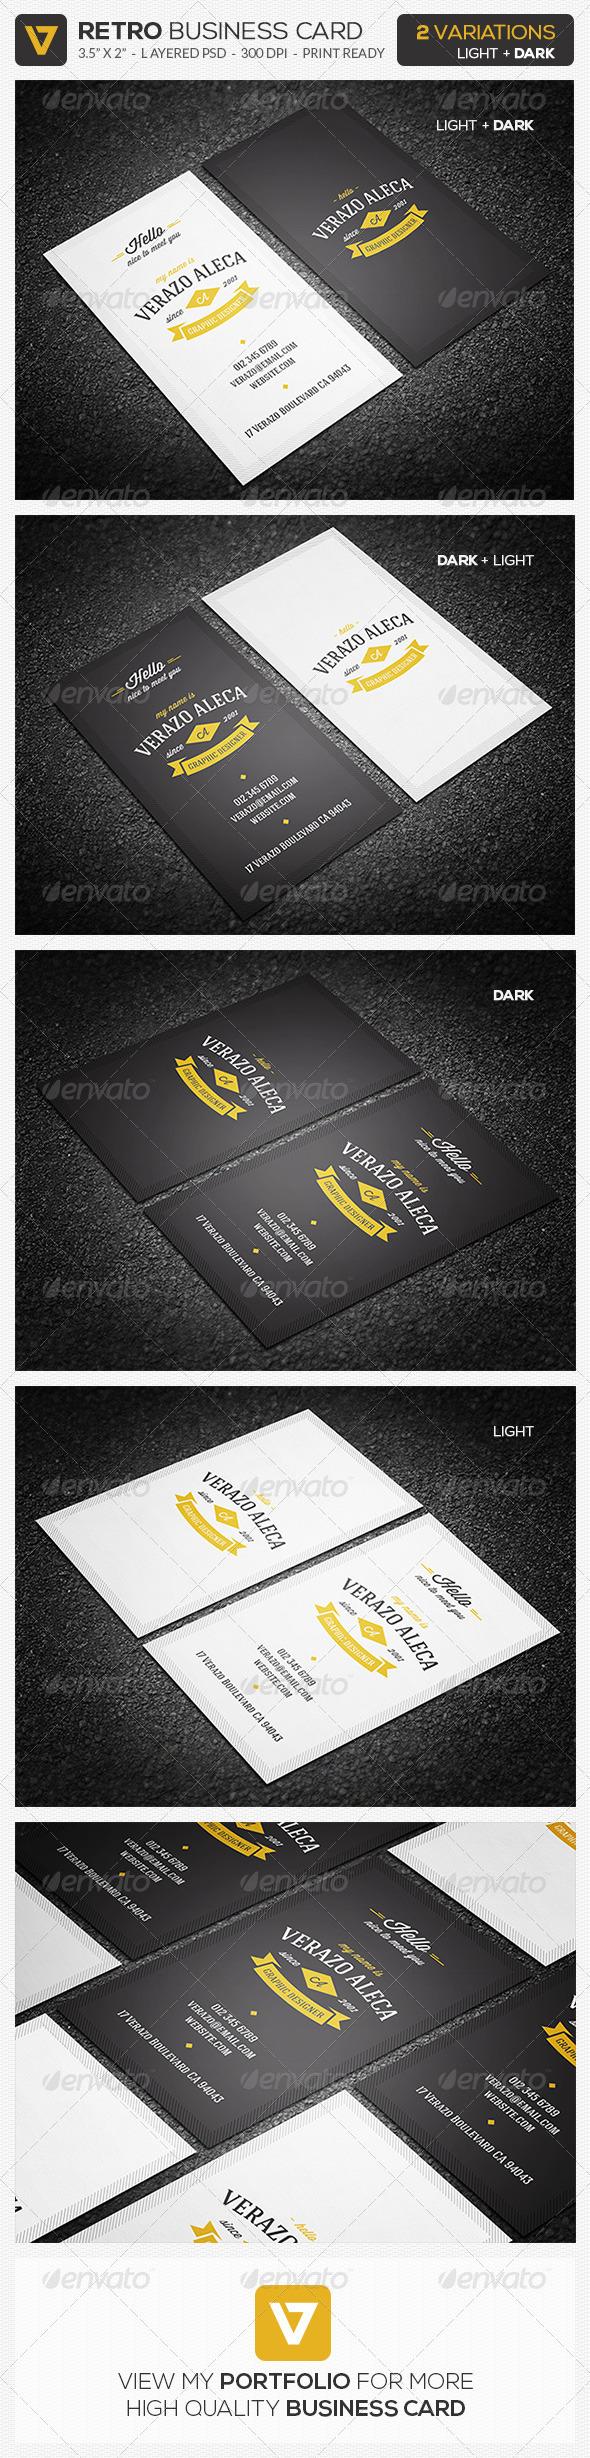 GraphicRiver Retro Vintage Business Card 01 8410901